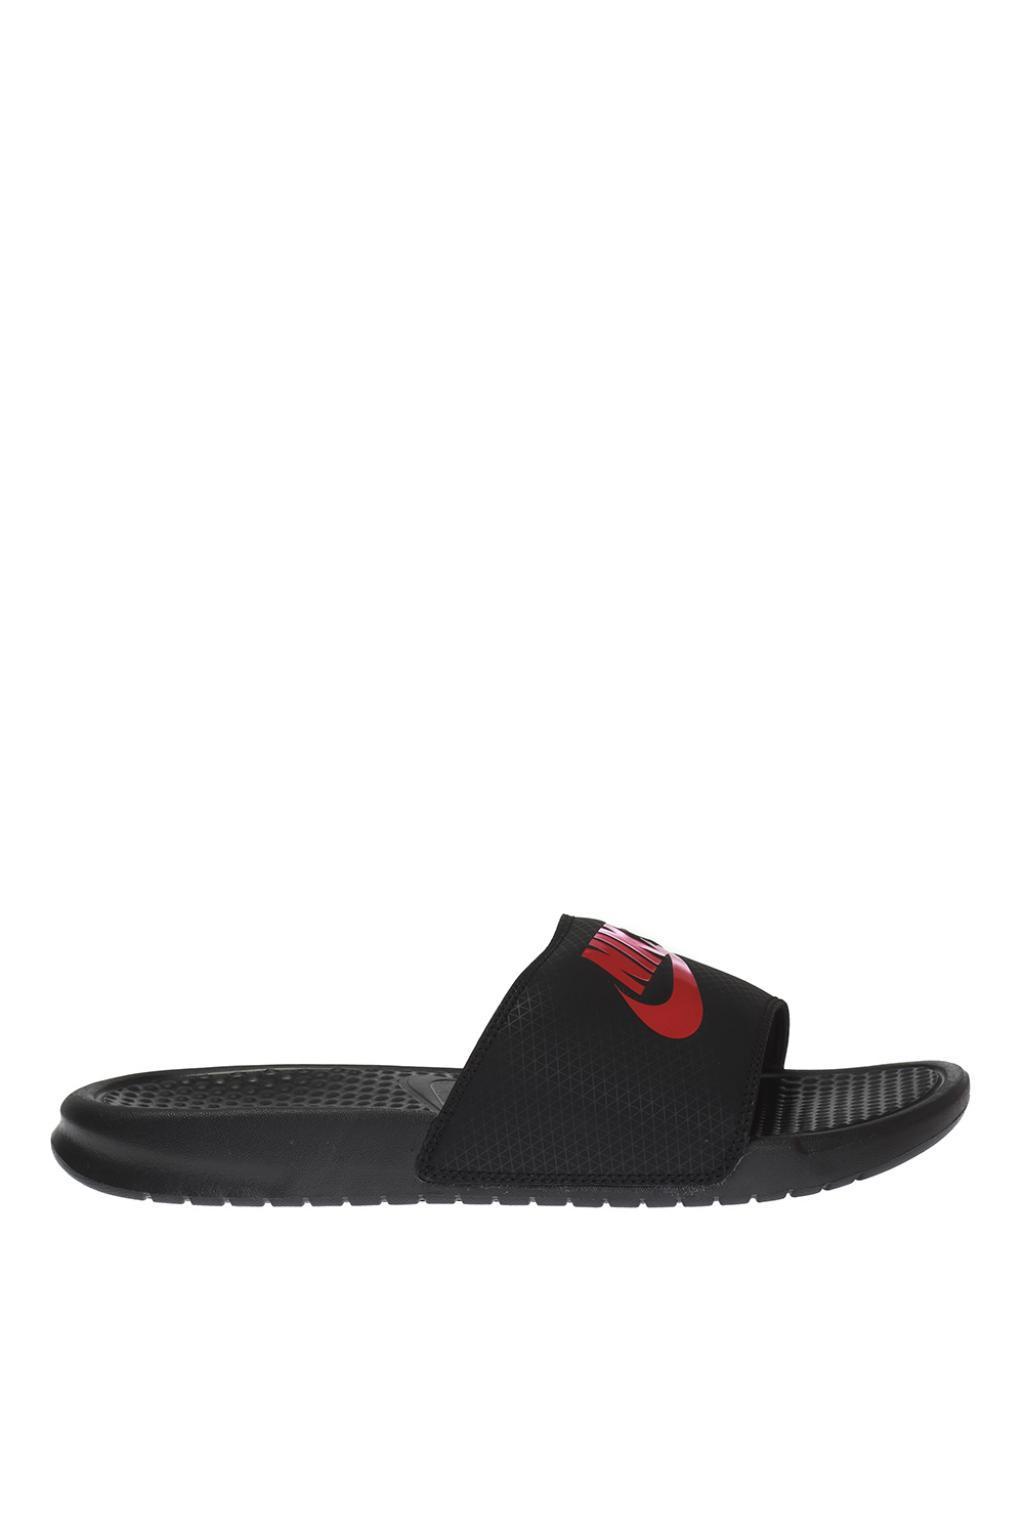 Lyst - Nike  benassi Jdi  Branded Slides in Black for Men 8d94cdb00